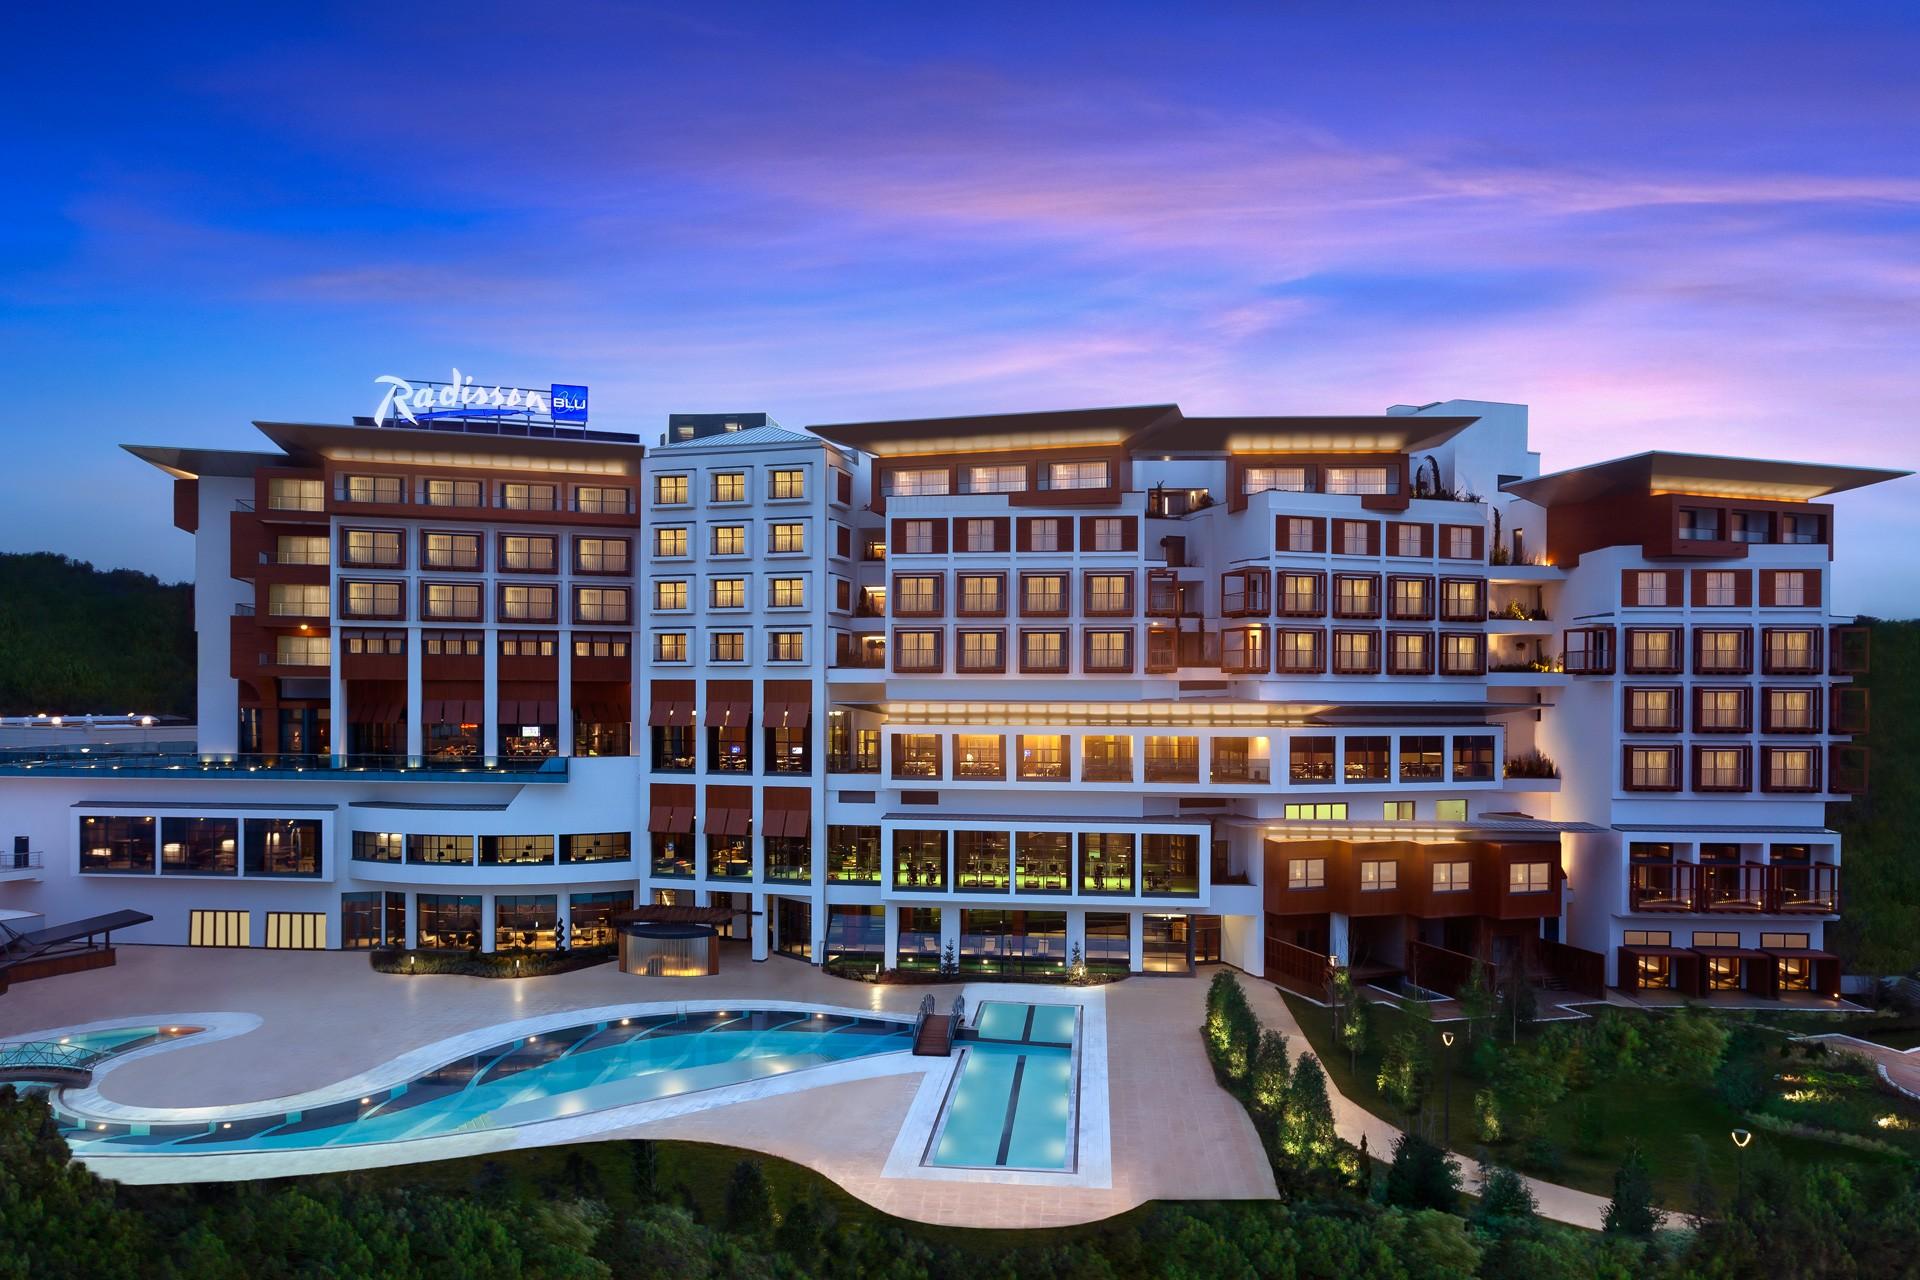 Radisson Blu Hotel Tuzla | Exterior View